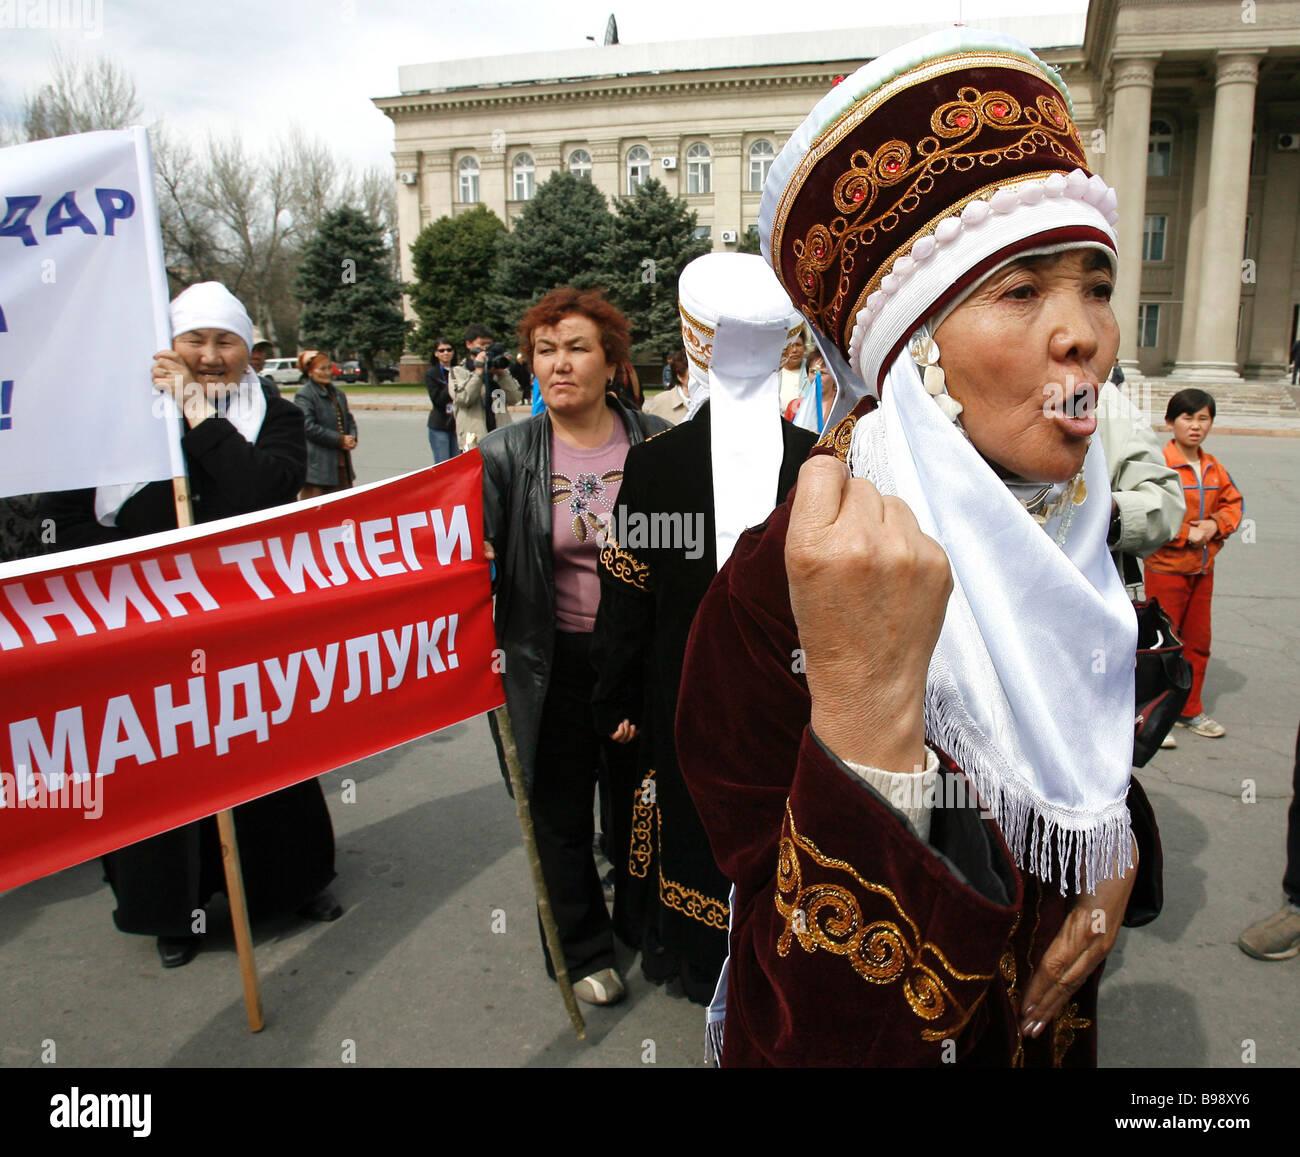 Continued Bishkek hunger strike by radical opposition demanding resignation of Kyrgyz President Kurmanbek Bakiyev - Stock Image